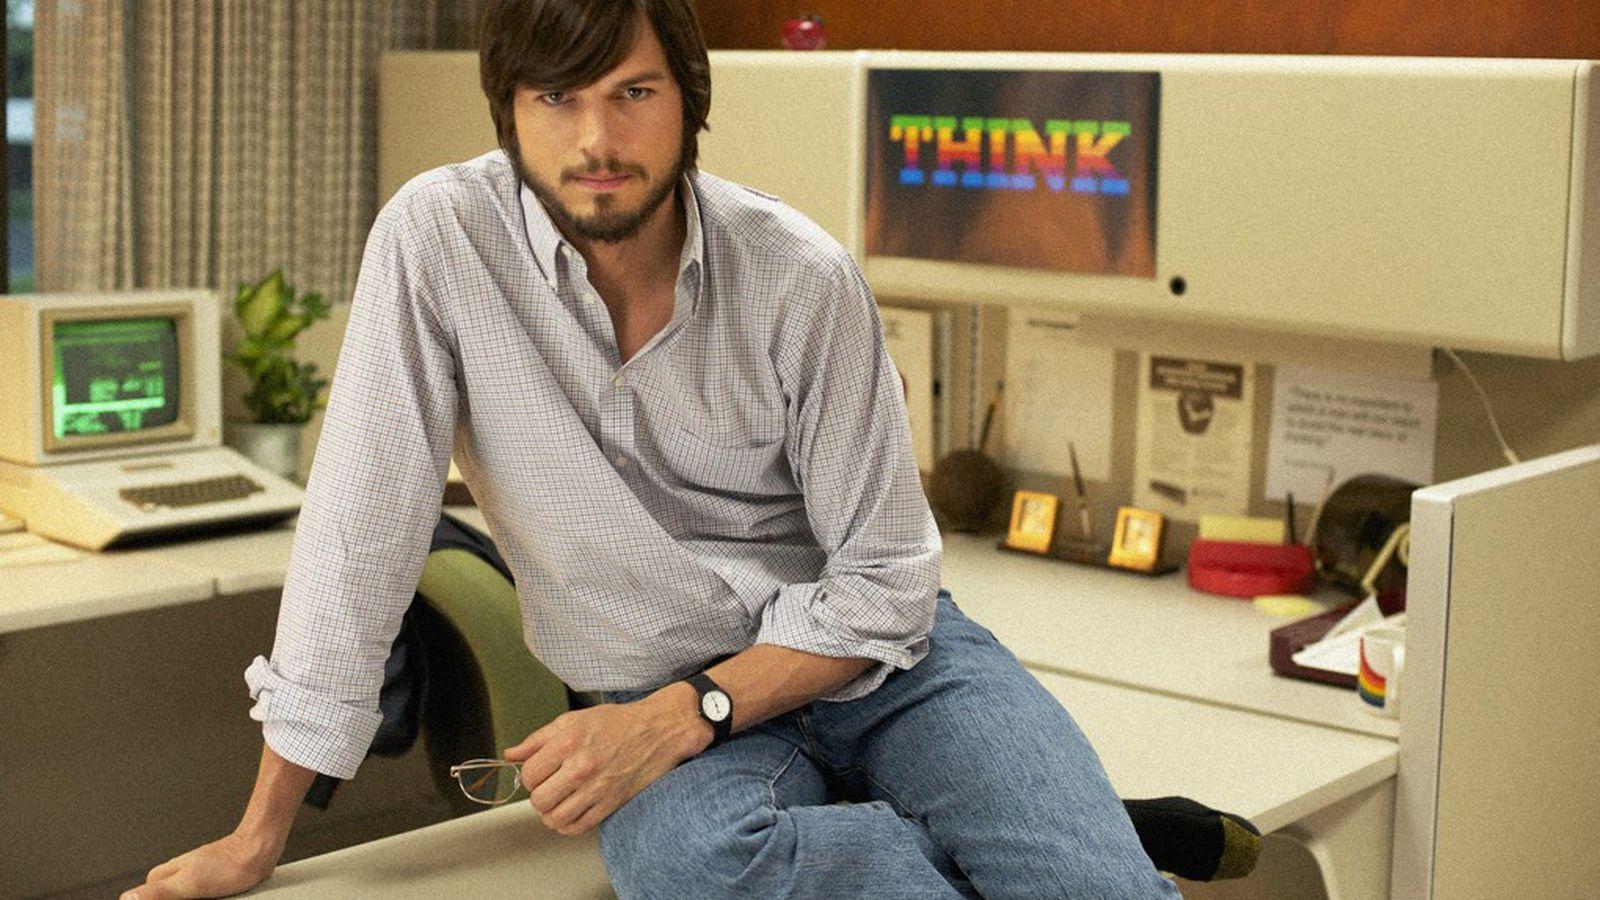 Jobs Review Ashton Kutcher Surprises With A Feverish